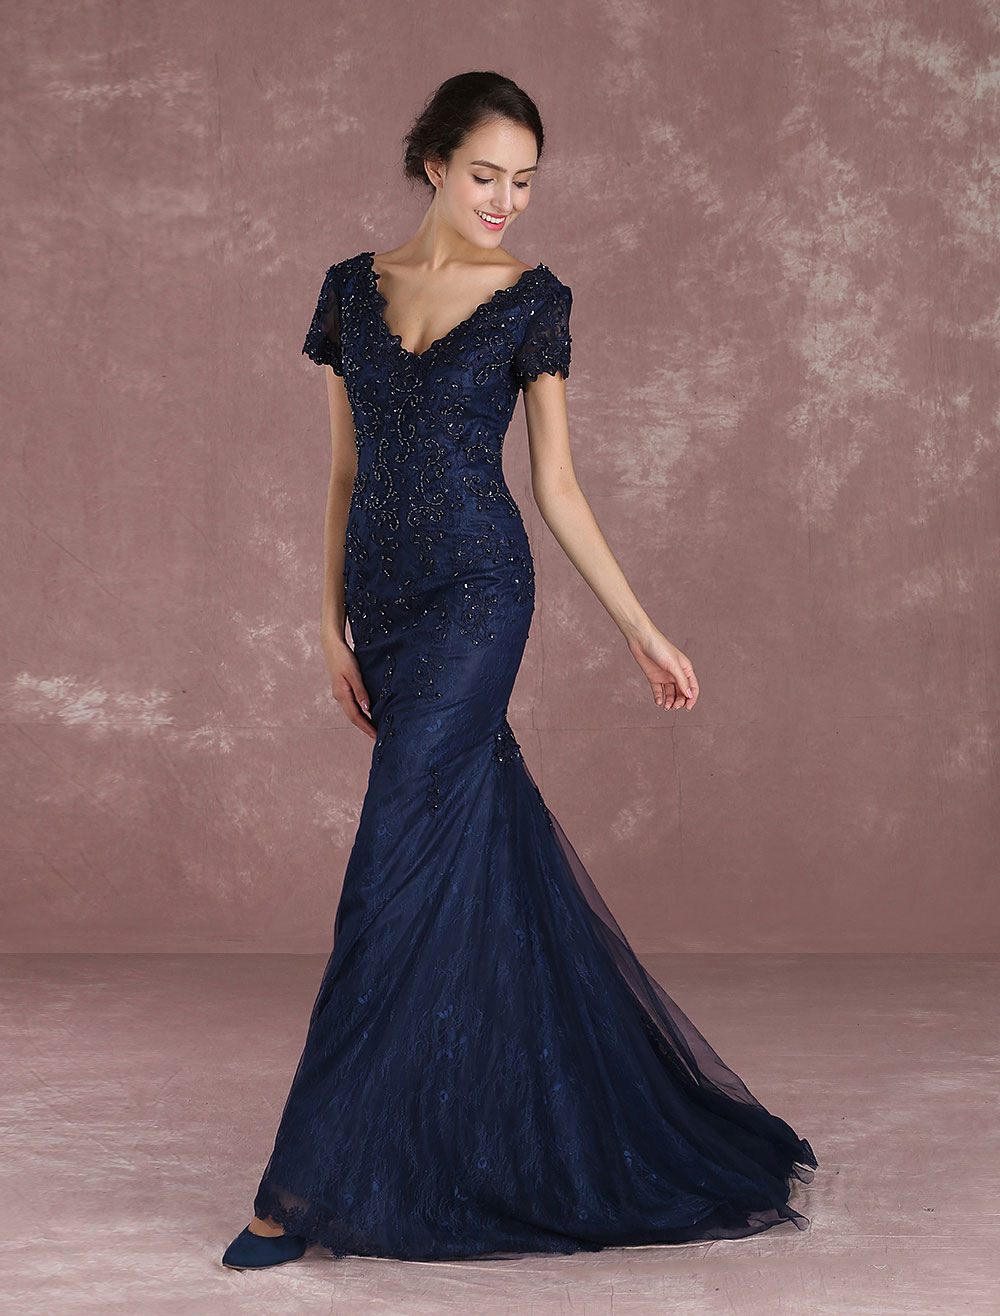 Mermaid Evening Dresses Lace Applique Beading Occasion Dresses Dark Navy V Neck Short Sleeve Party Dress (Wedding) photo